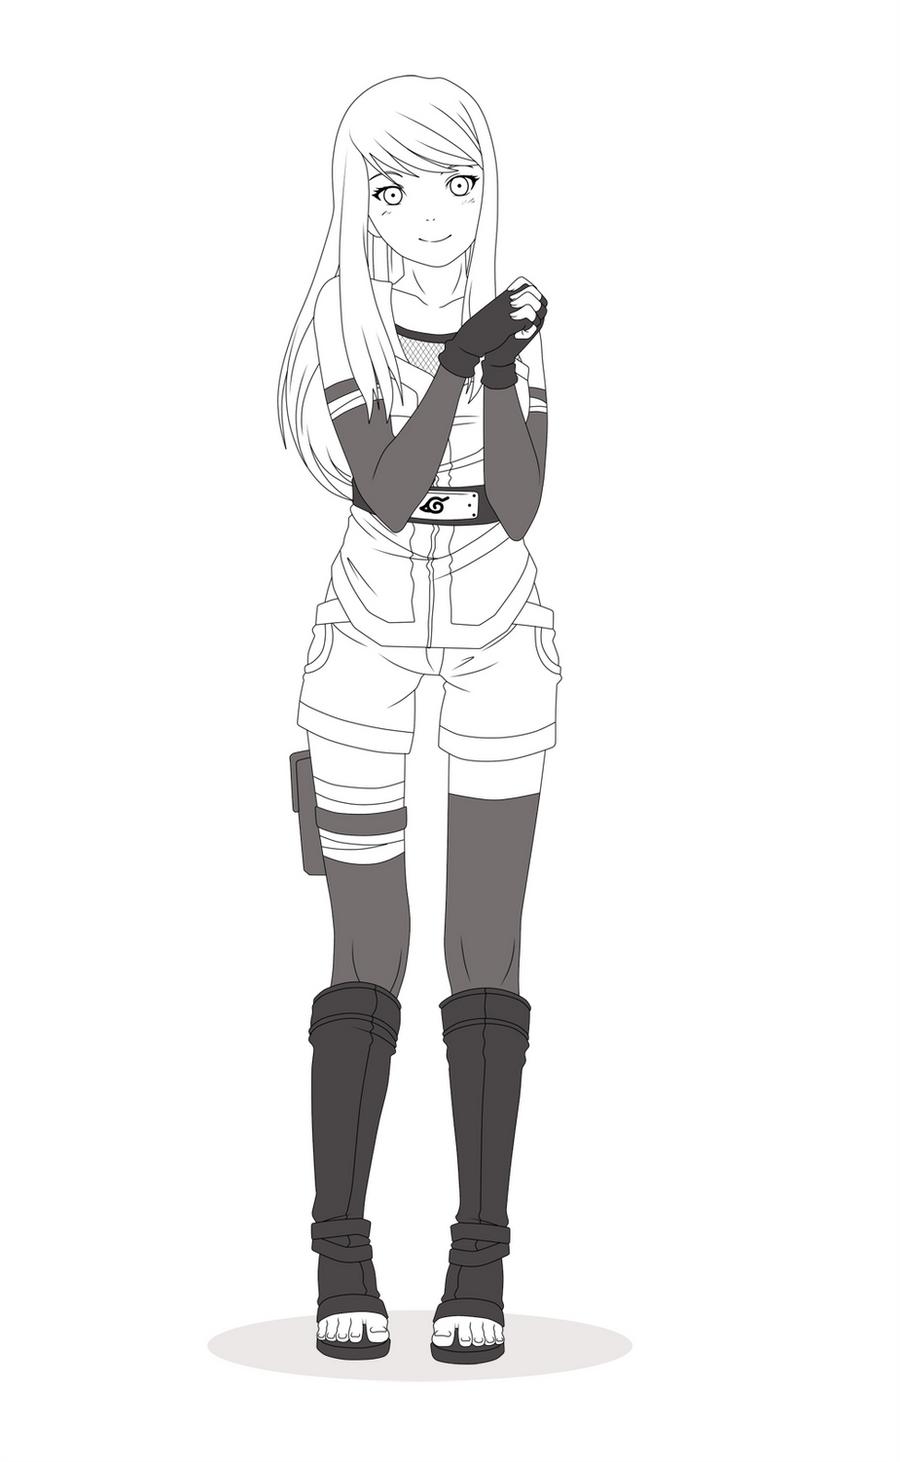 Anime Characters Full Body : Natsuki manga fullbody by kleenesoph on deviantart